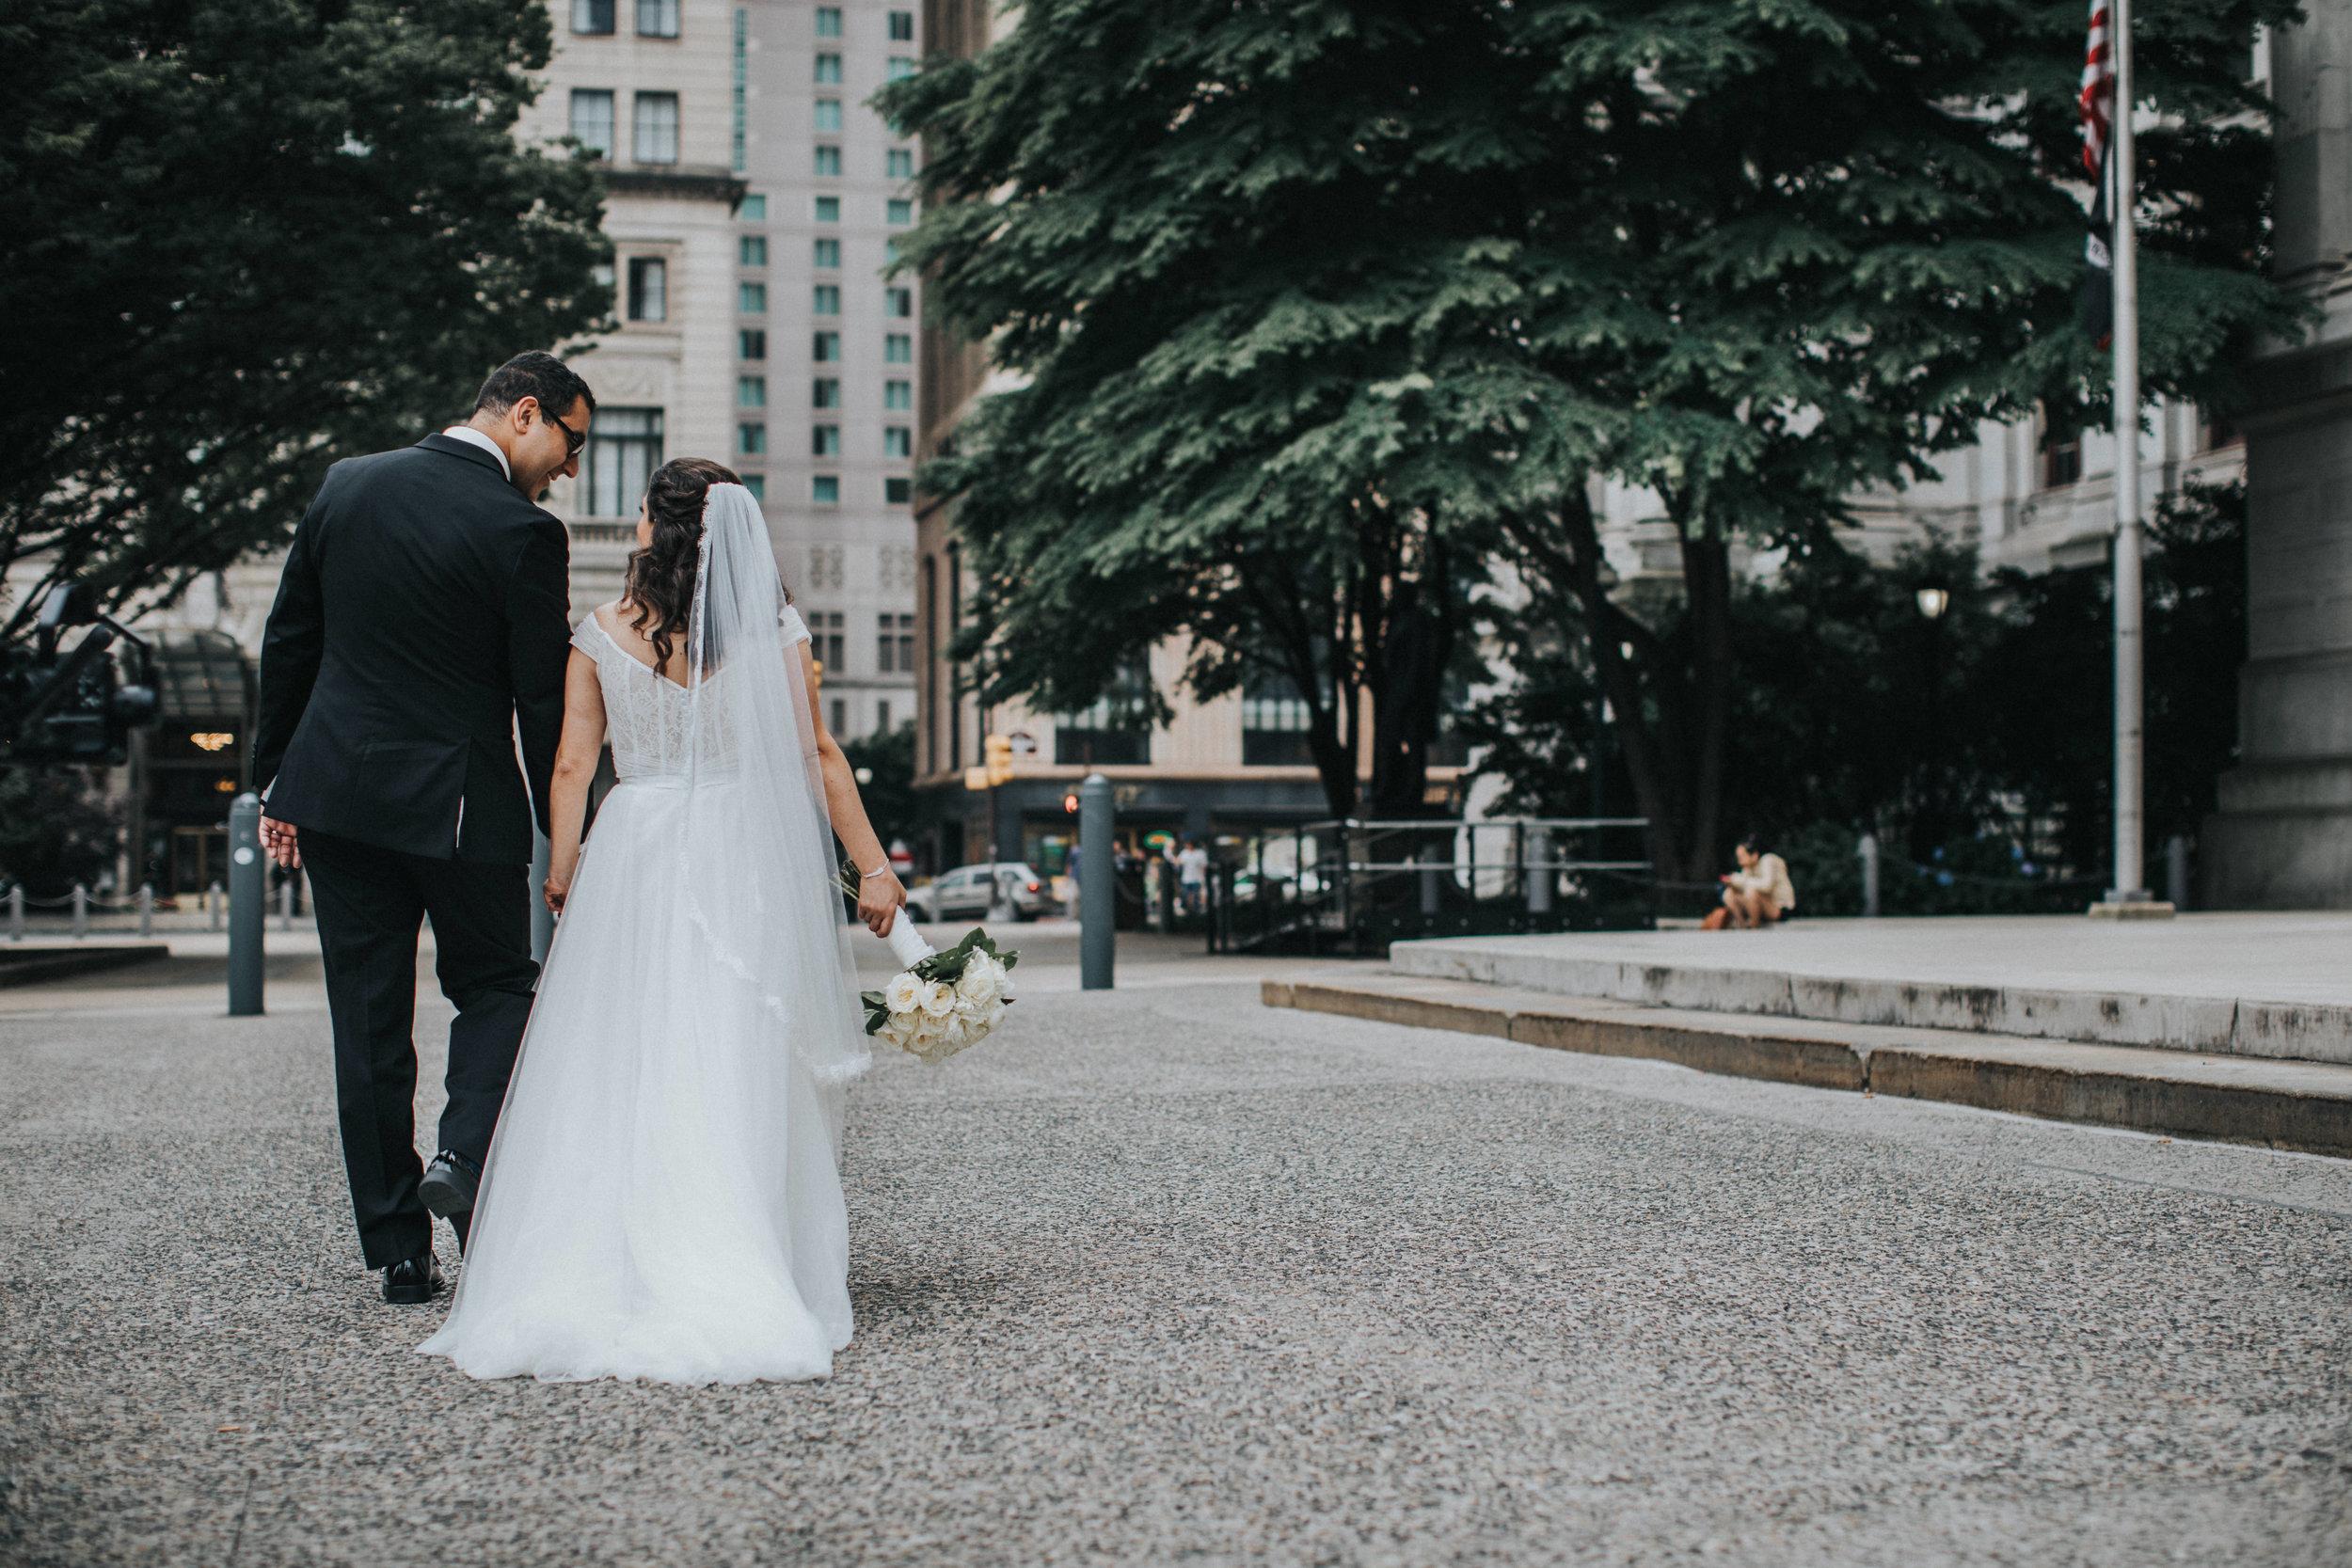 JennaLynnPhotography-NJWeddingPhotographer-Philadelphia-Wedding-ArtsBallroom-BridalParty-19.jpg